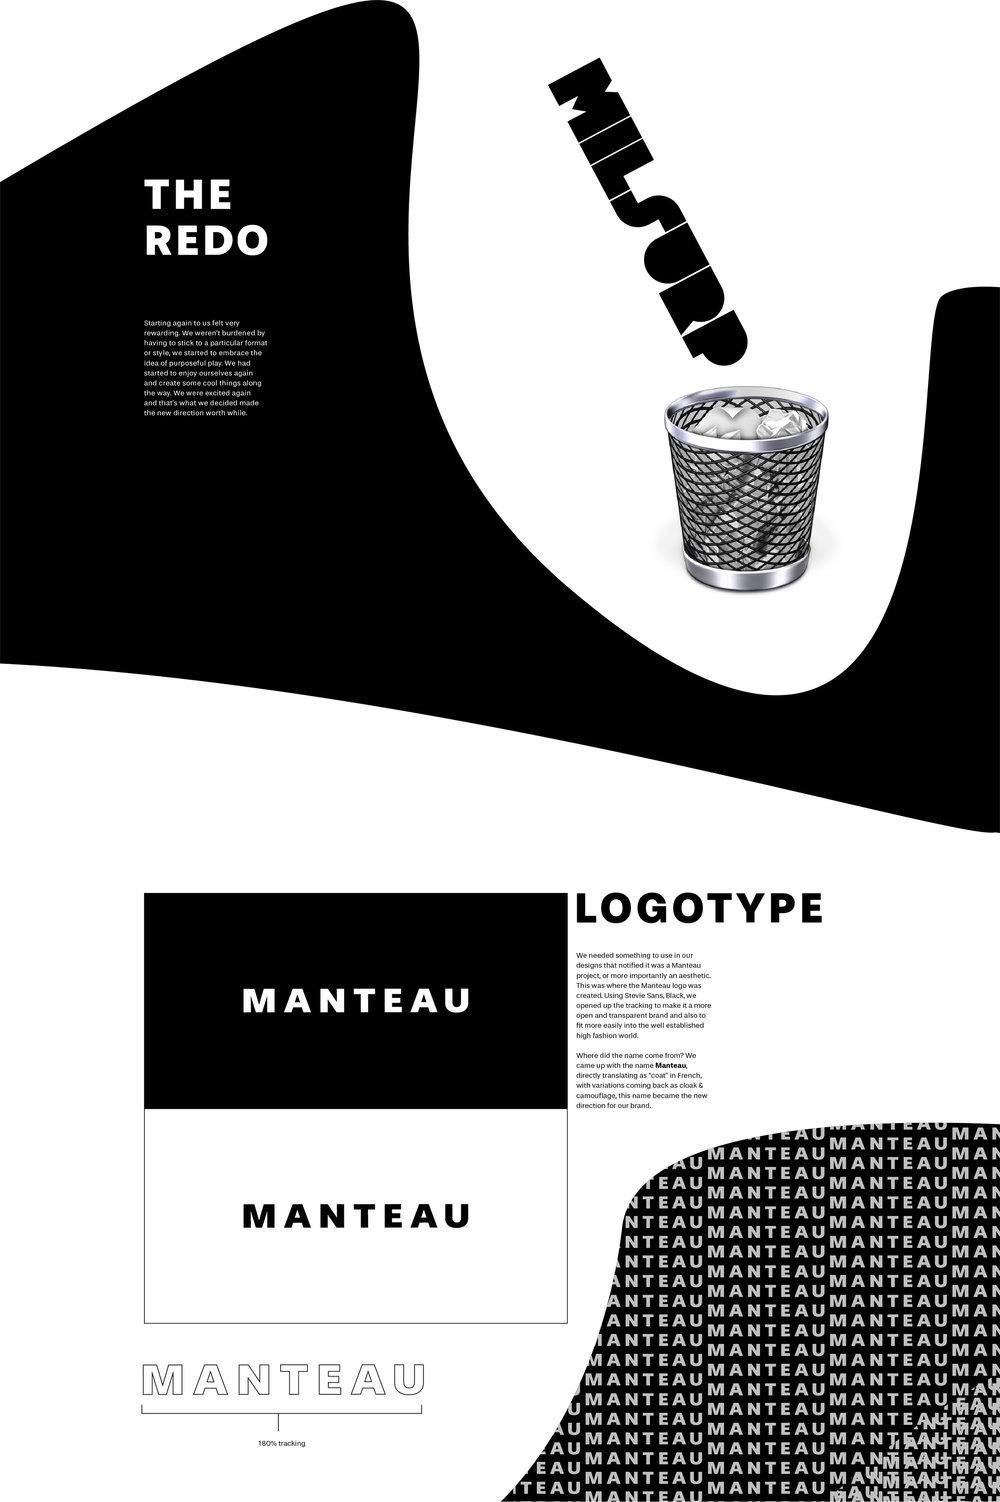 Manteau+xp4.jpg